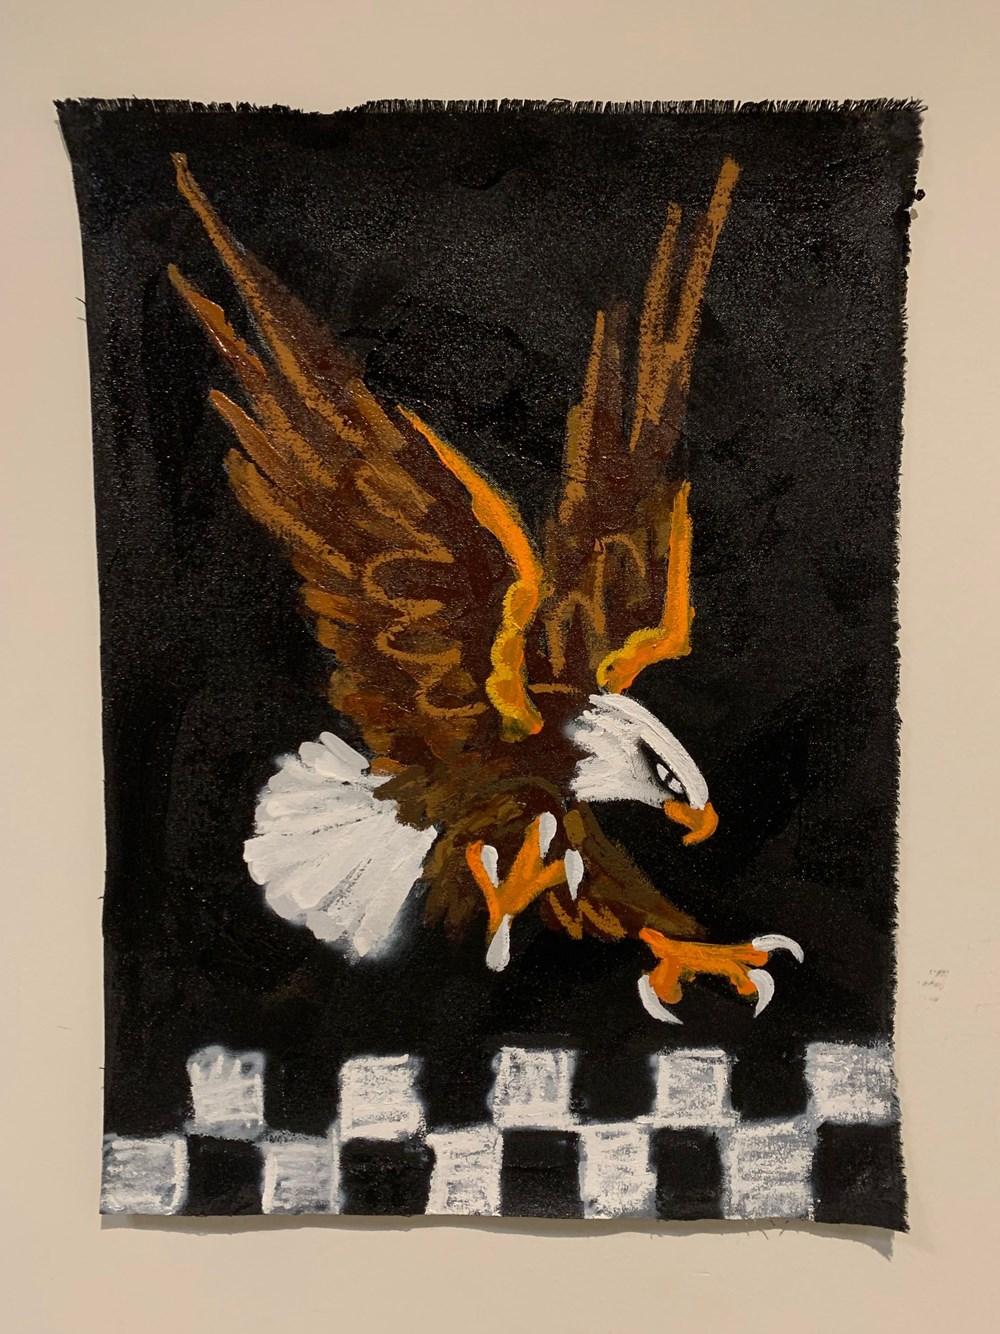 Art Fundraiser LA | Timed Auction - Lot 33, Nico Bassill, Untitled (Eagle)